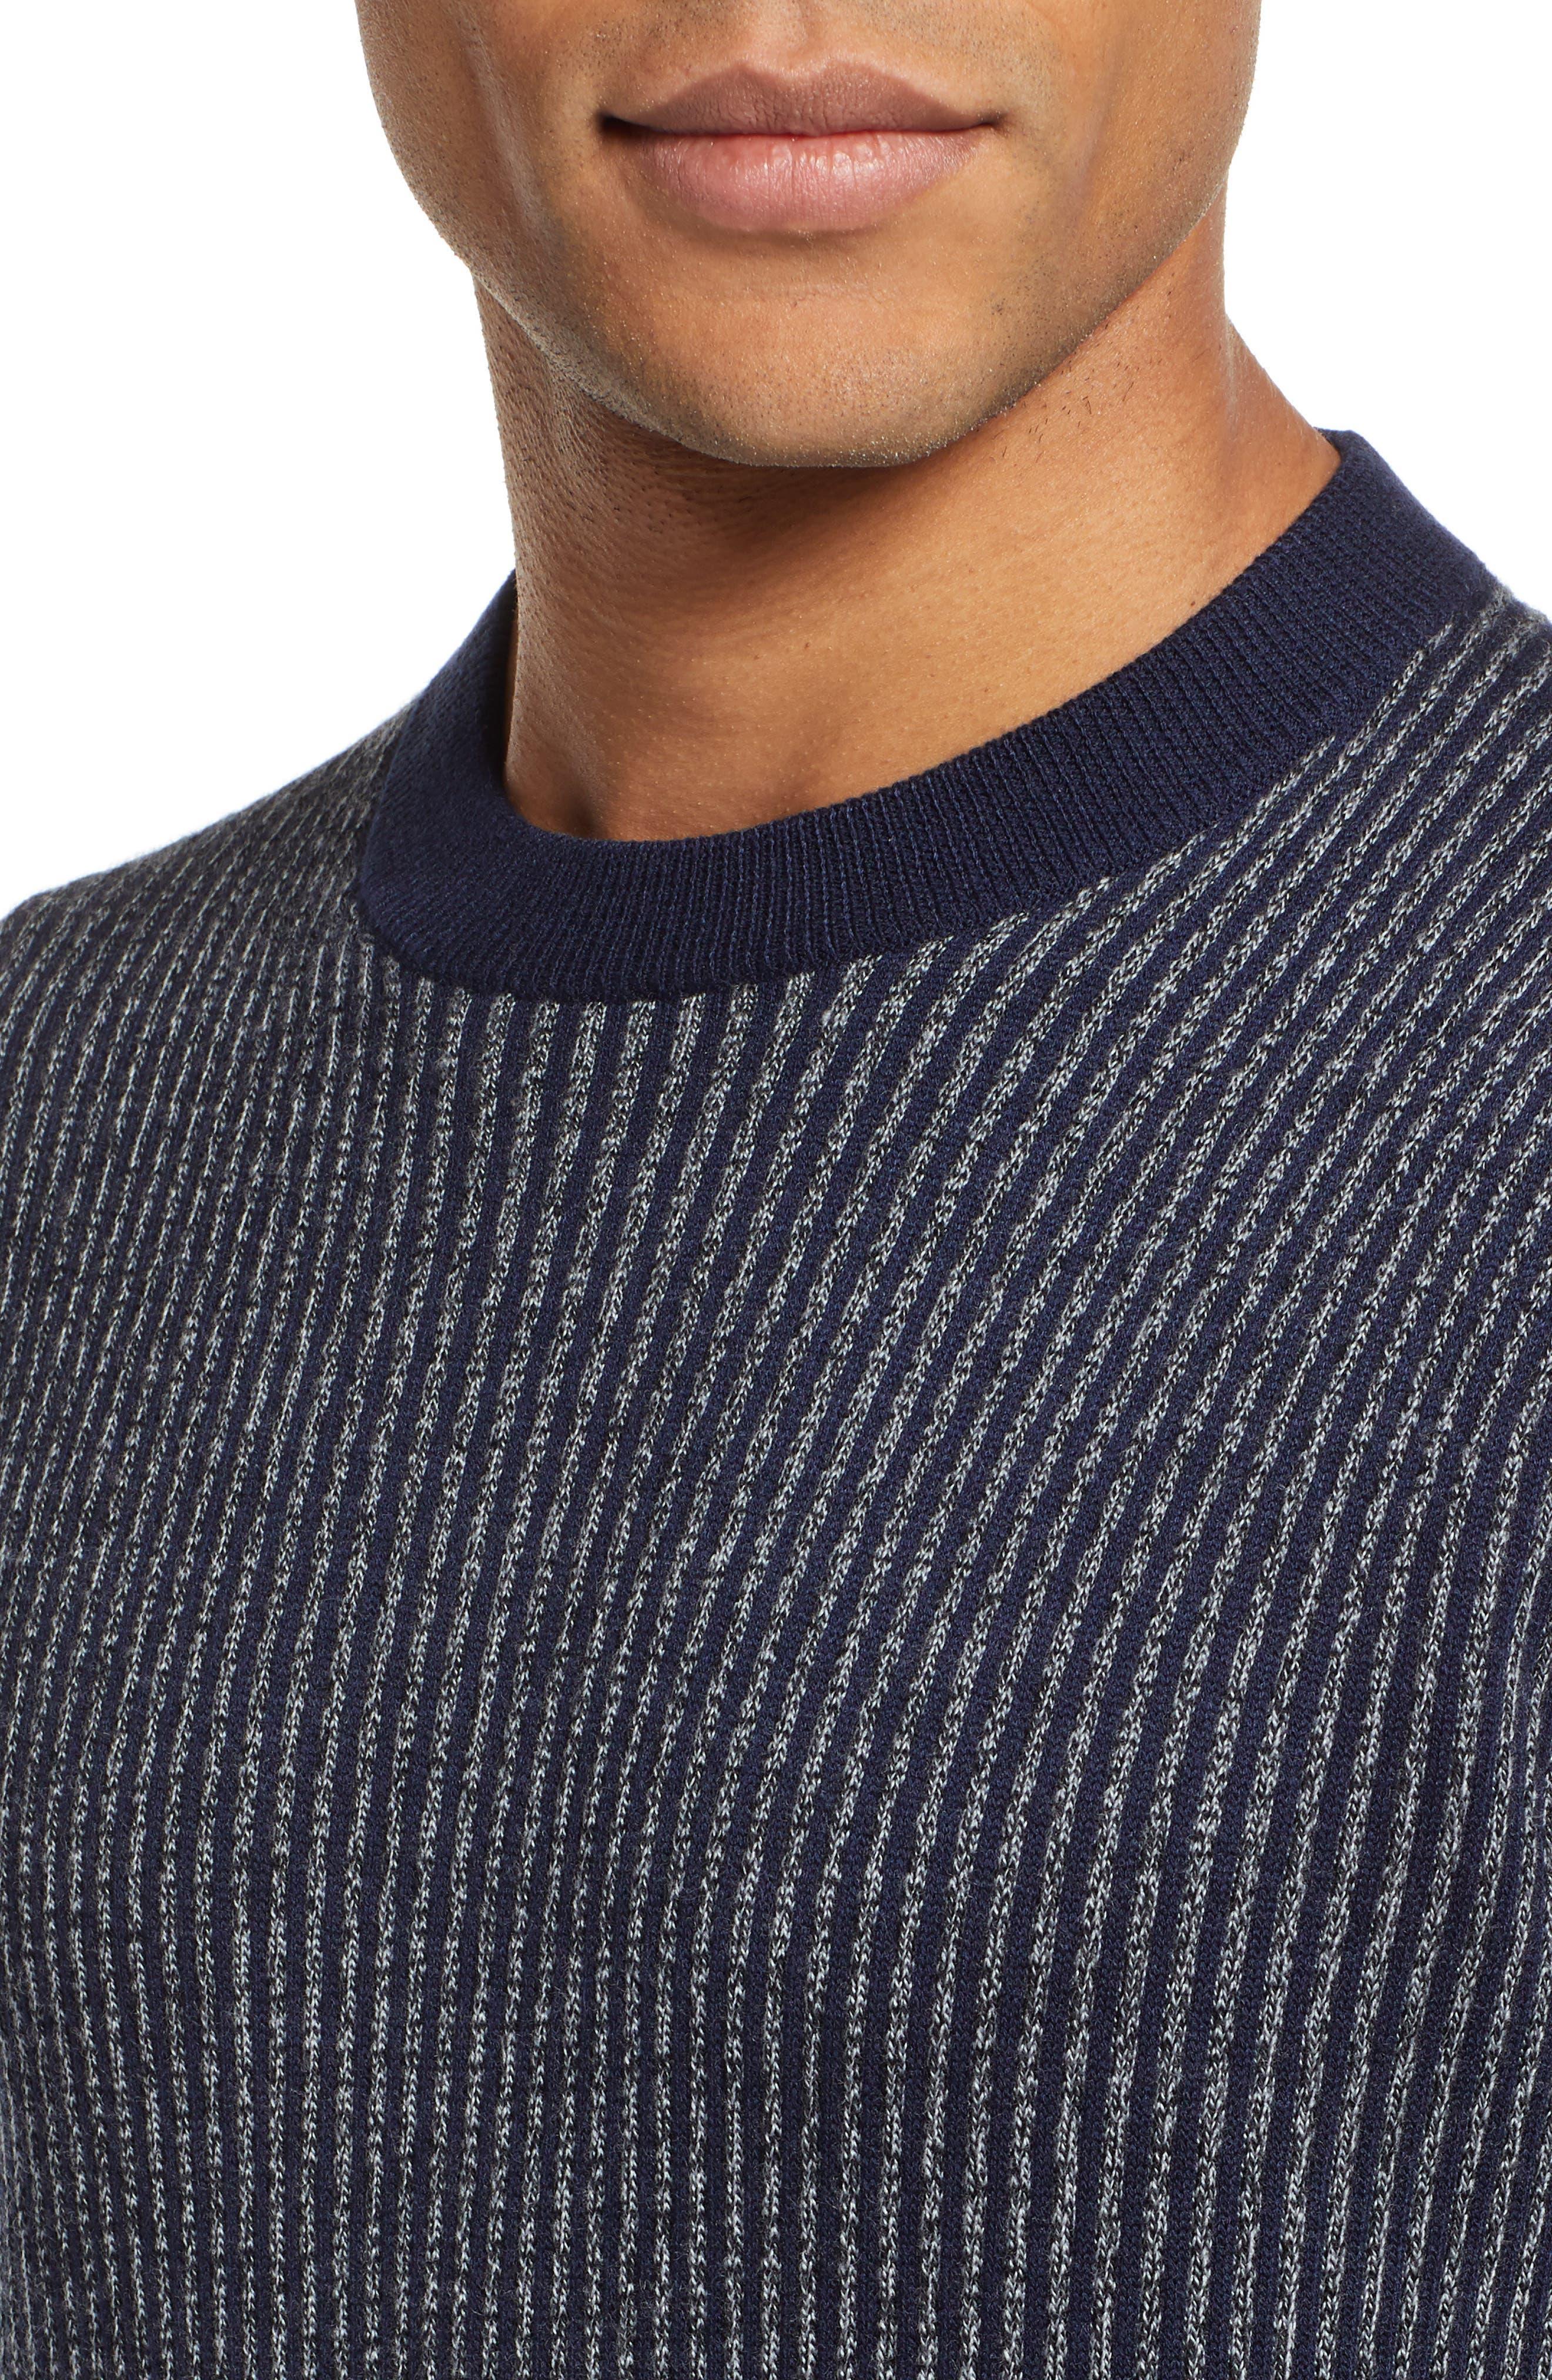 Jinxitt Crewneck Sweater,                             Alternate thumbnail 4, color,                             NAVY